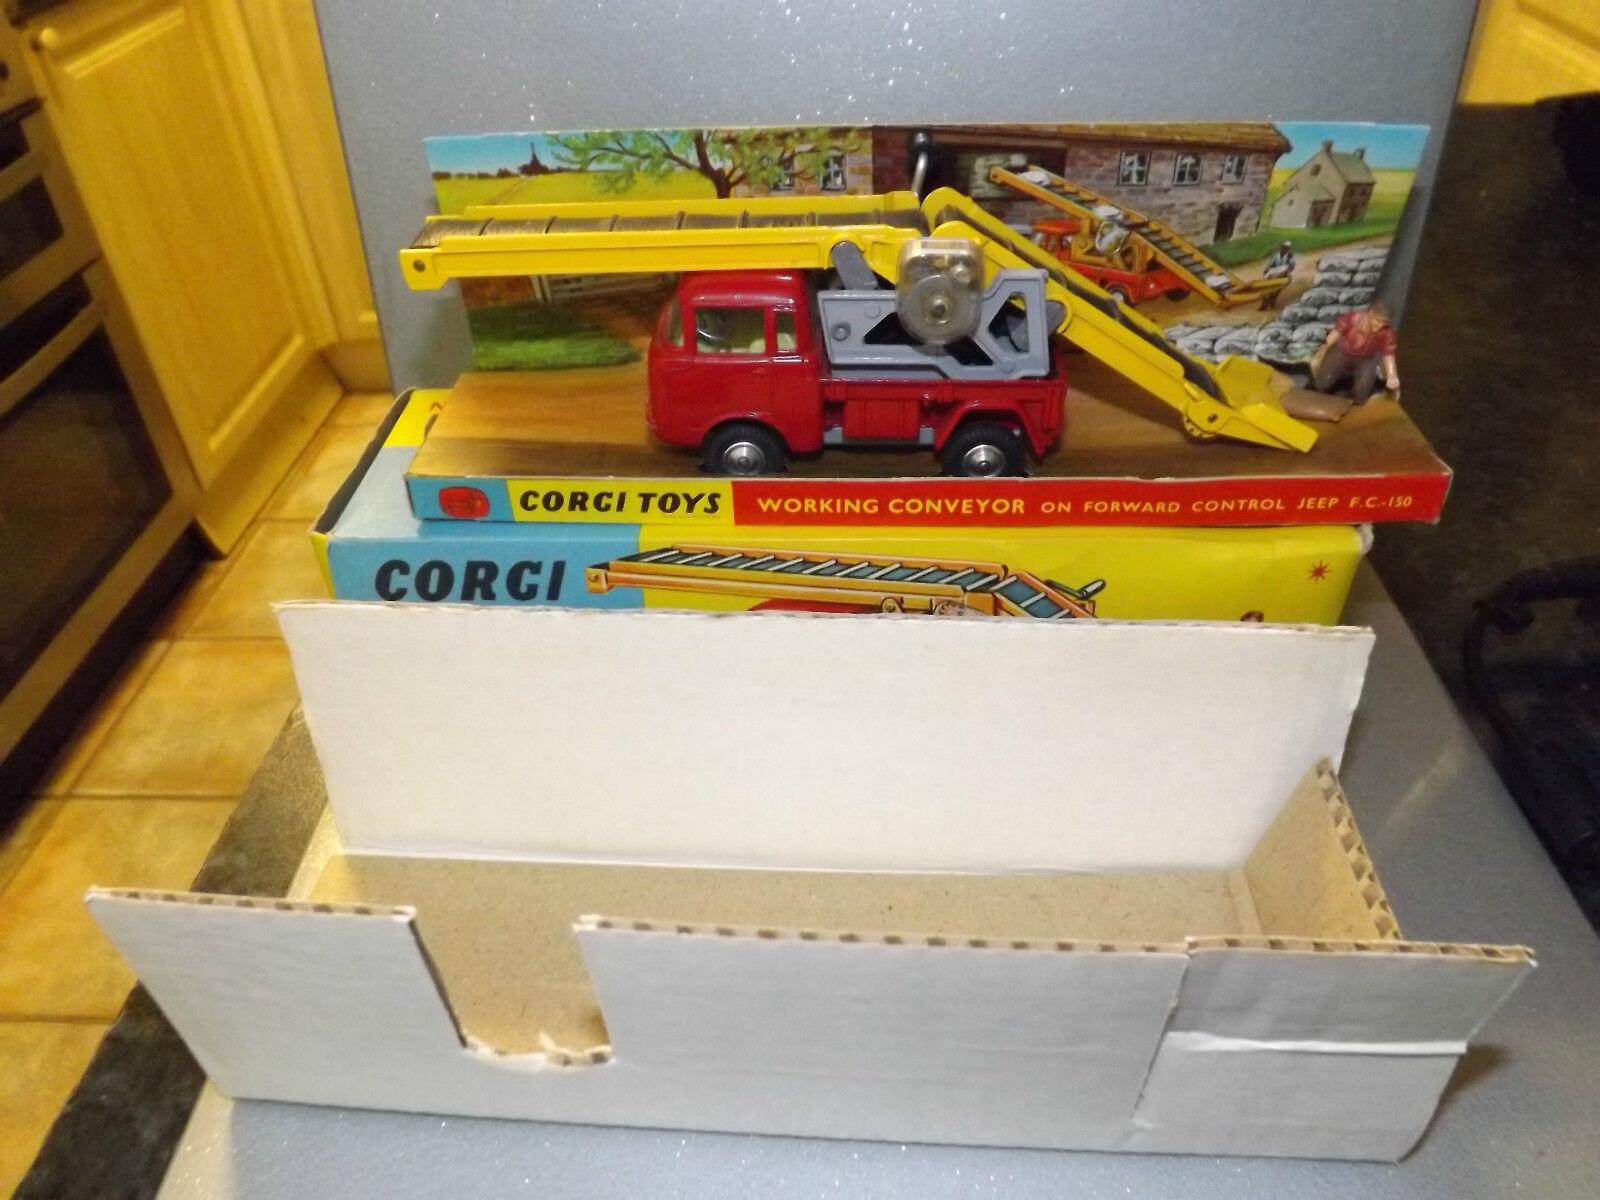 Corgi Corgi Corgi nº 64 working conveyor forward control jeep f.c.150 Comme neuf EN Vn/Comme neuf BOX   La Conception Professionnelle  863110